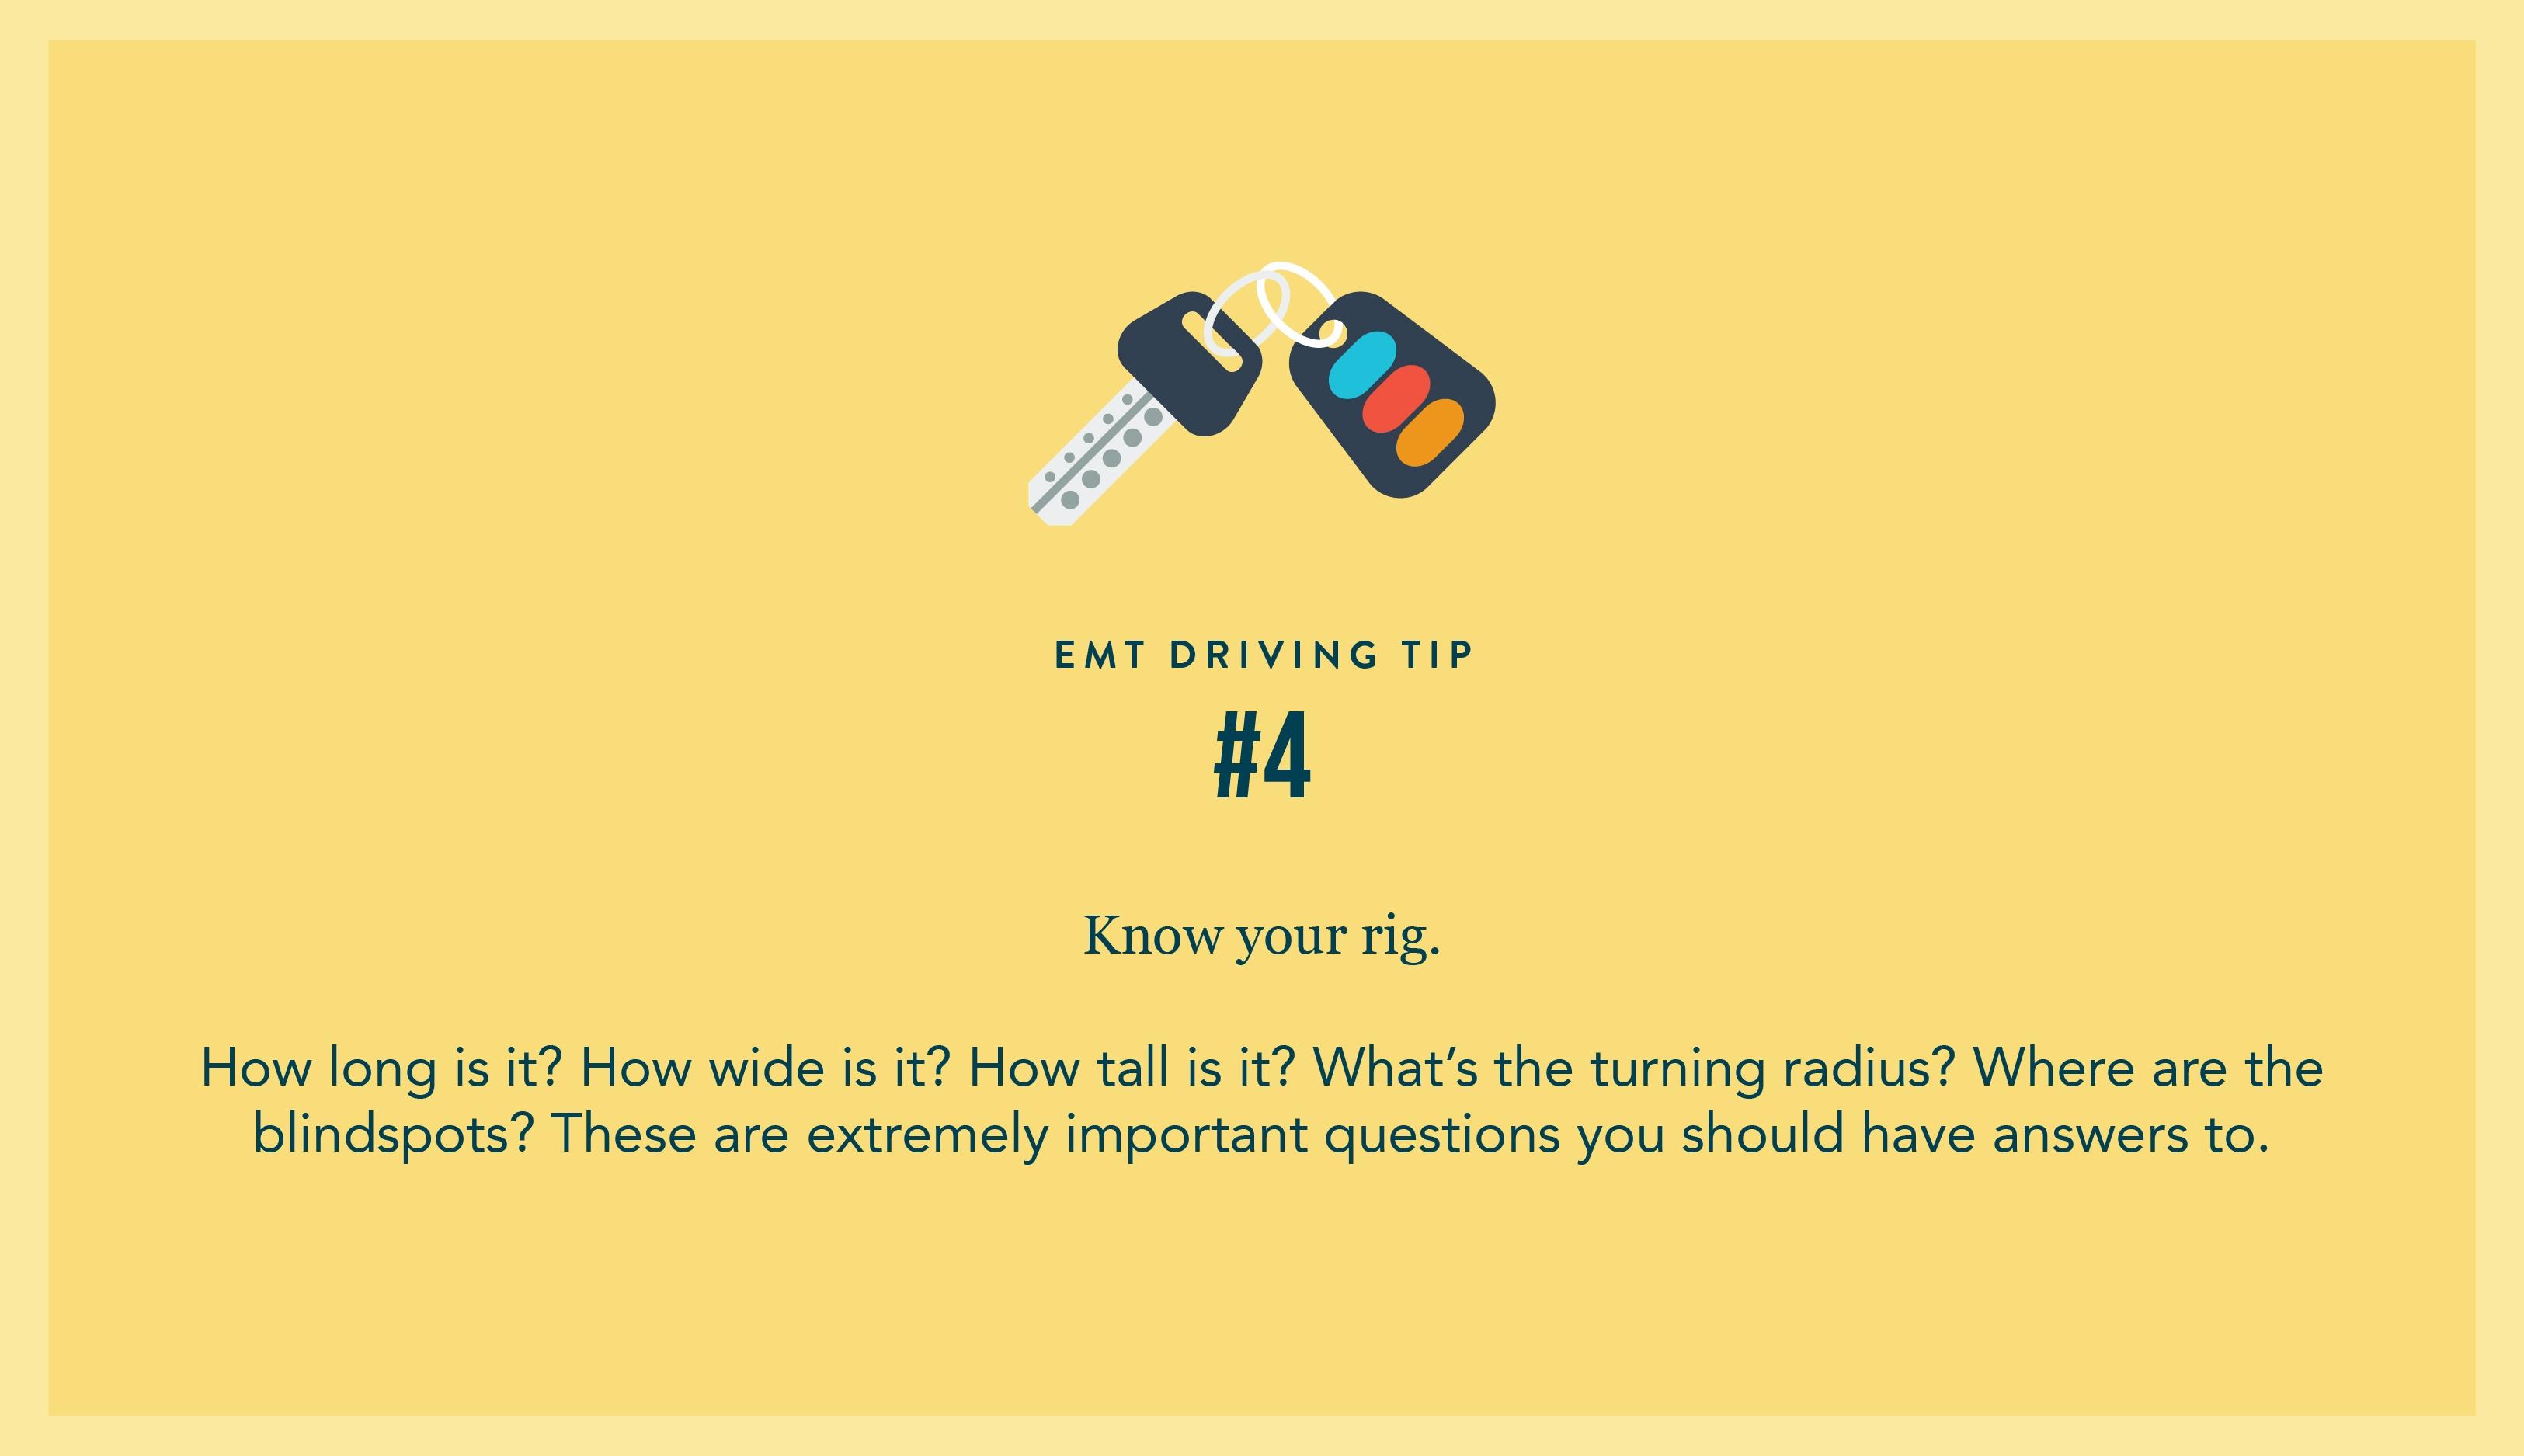 Driving Tips_WIDE-04.jpg